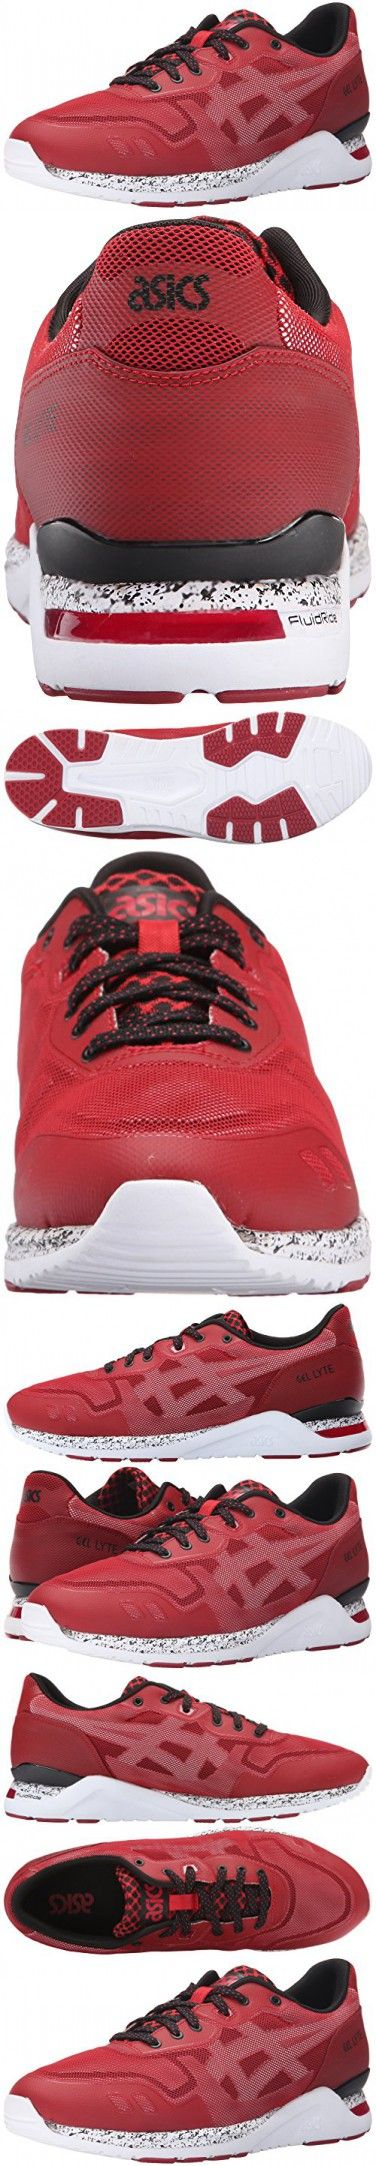 Asics Men's GEL-Lyte Evo NT Retro Tango Red/White Running Shoe - 7 M US